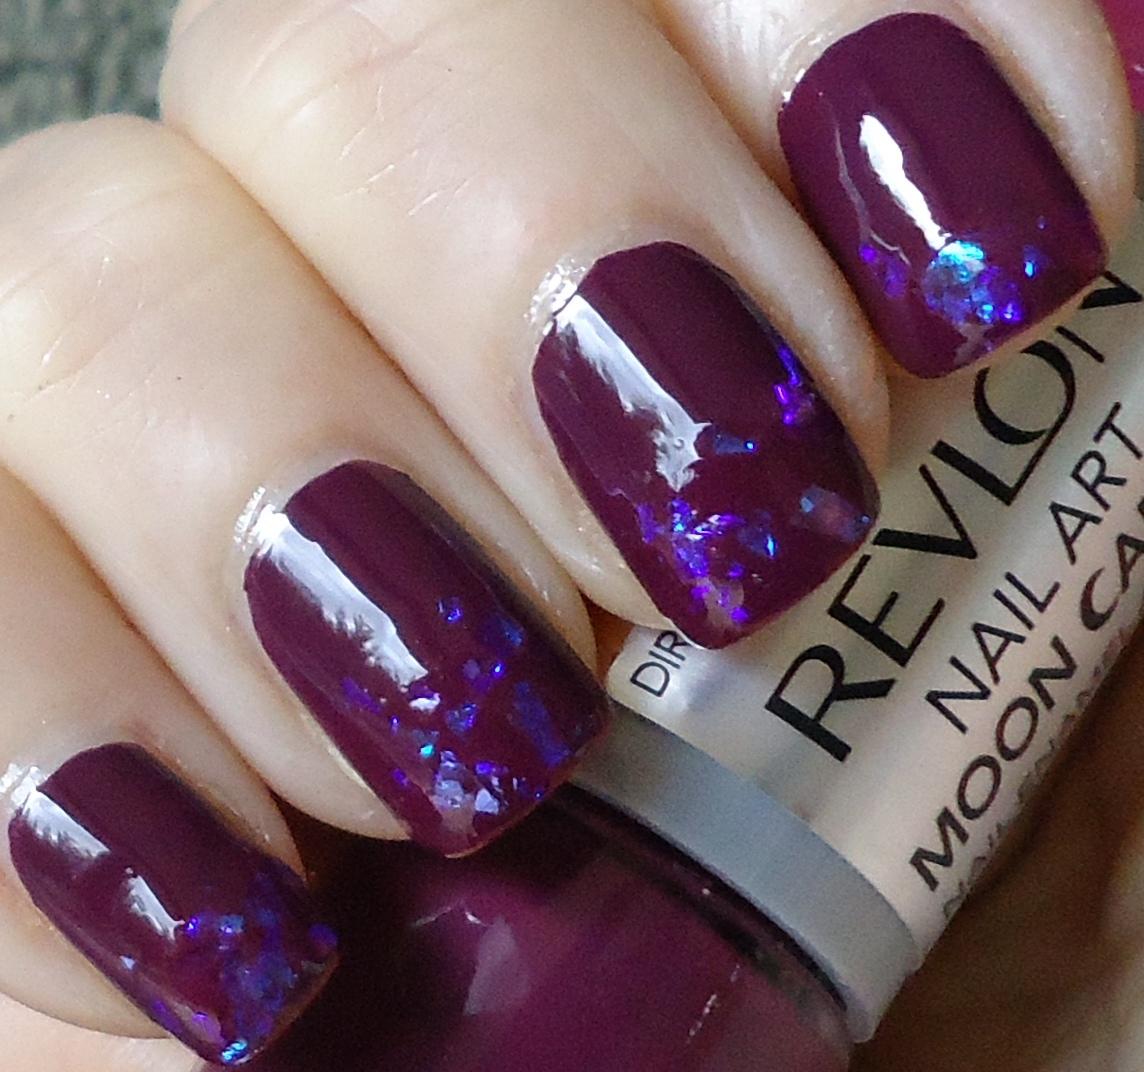 Making Up 4 My Age Revlon Moon Candy Nail Enamel 240 Eclipse